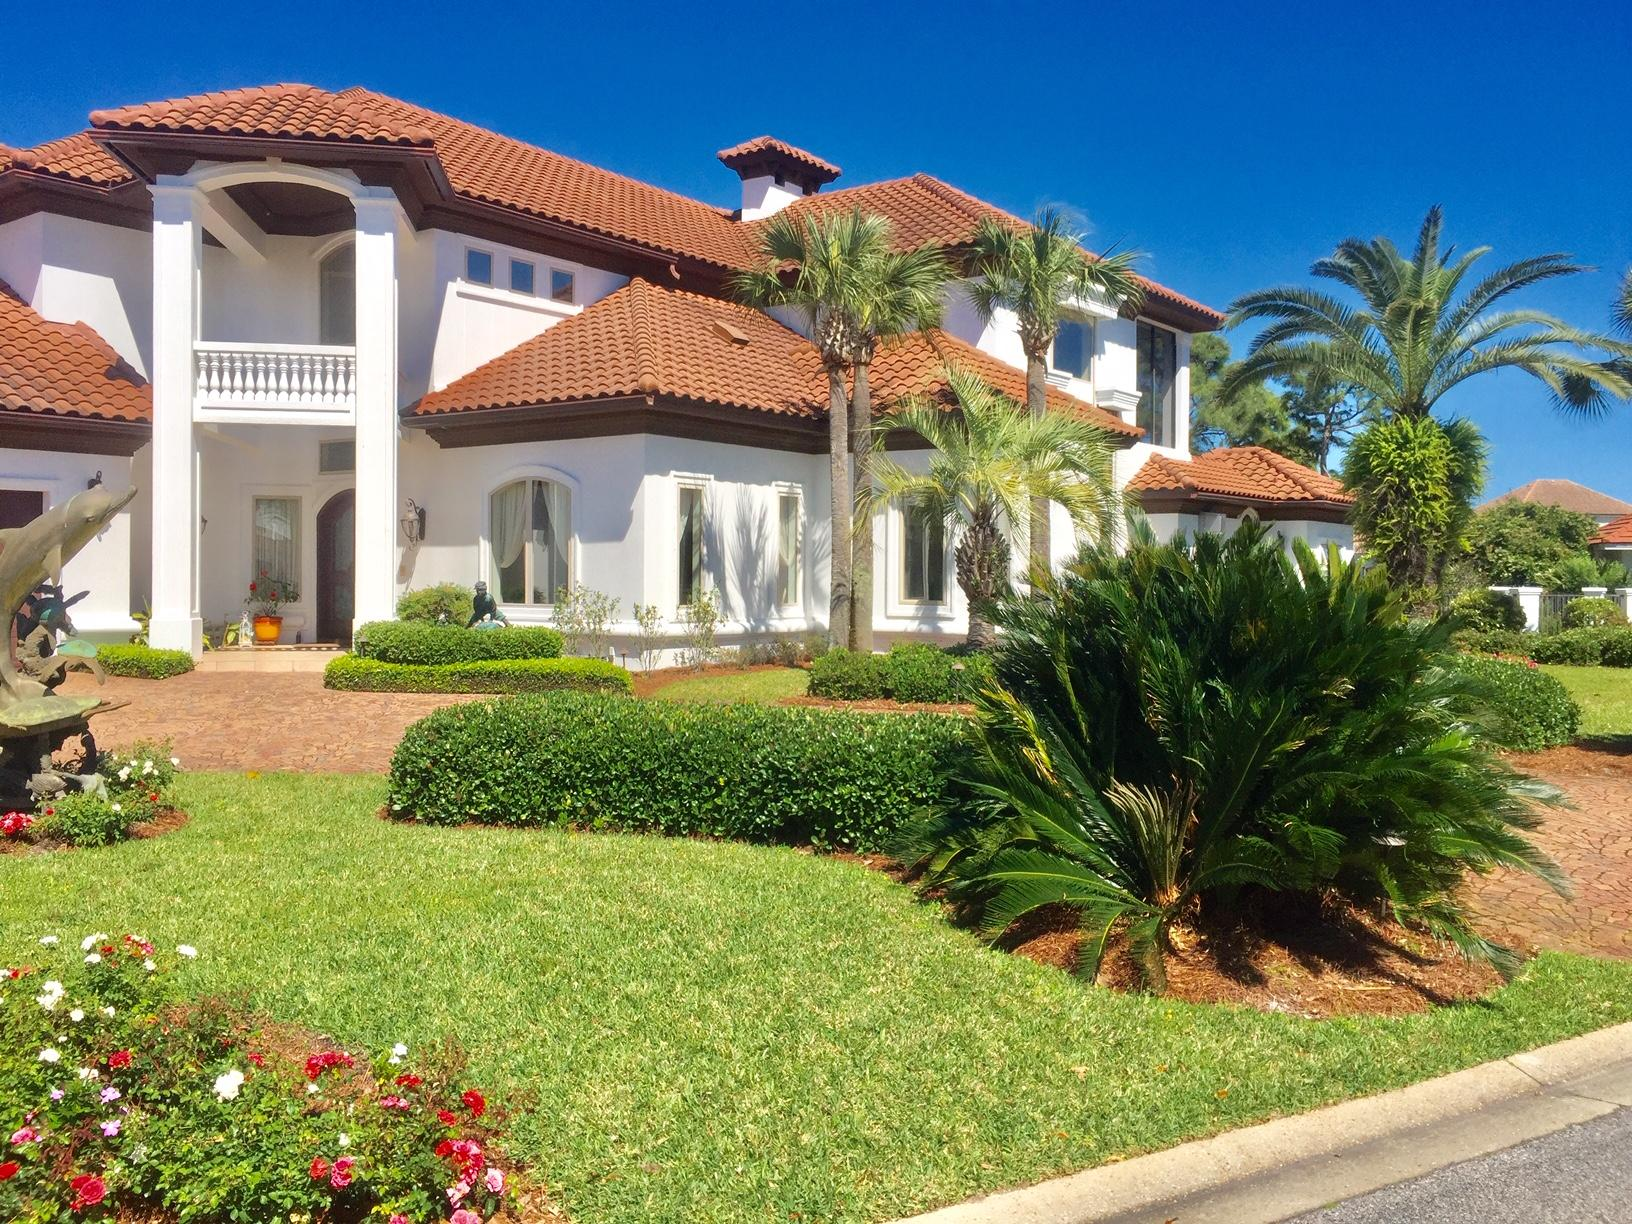 Photo of home for sale at 291 Corinthian, Destin FL